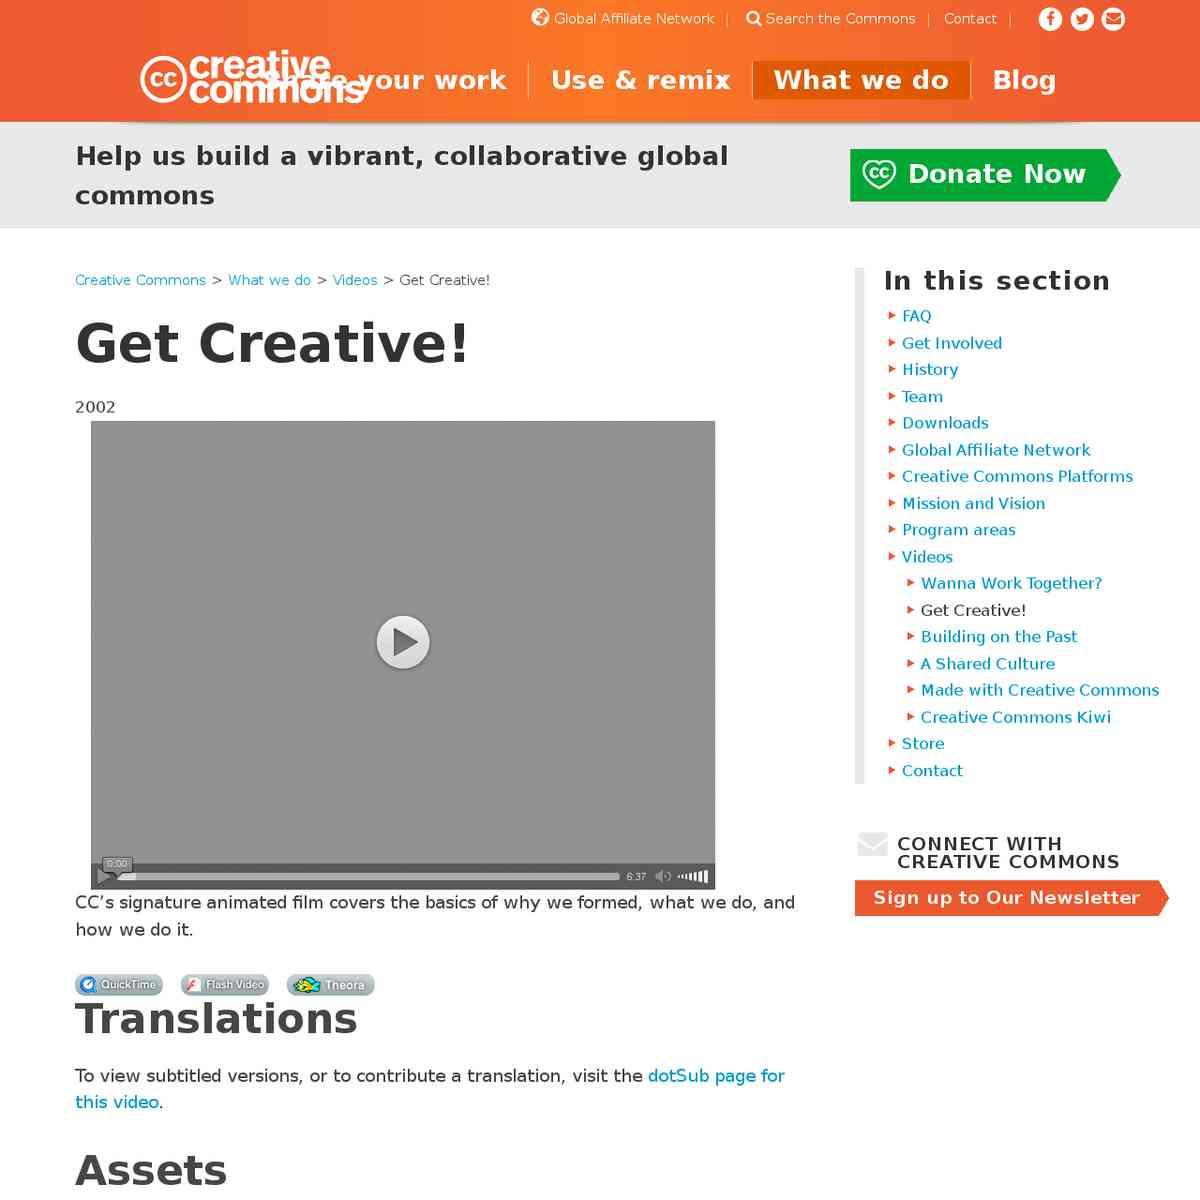 02.5 Get Creative: Creative Commons